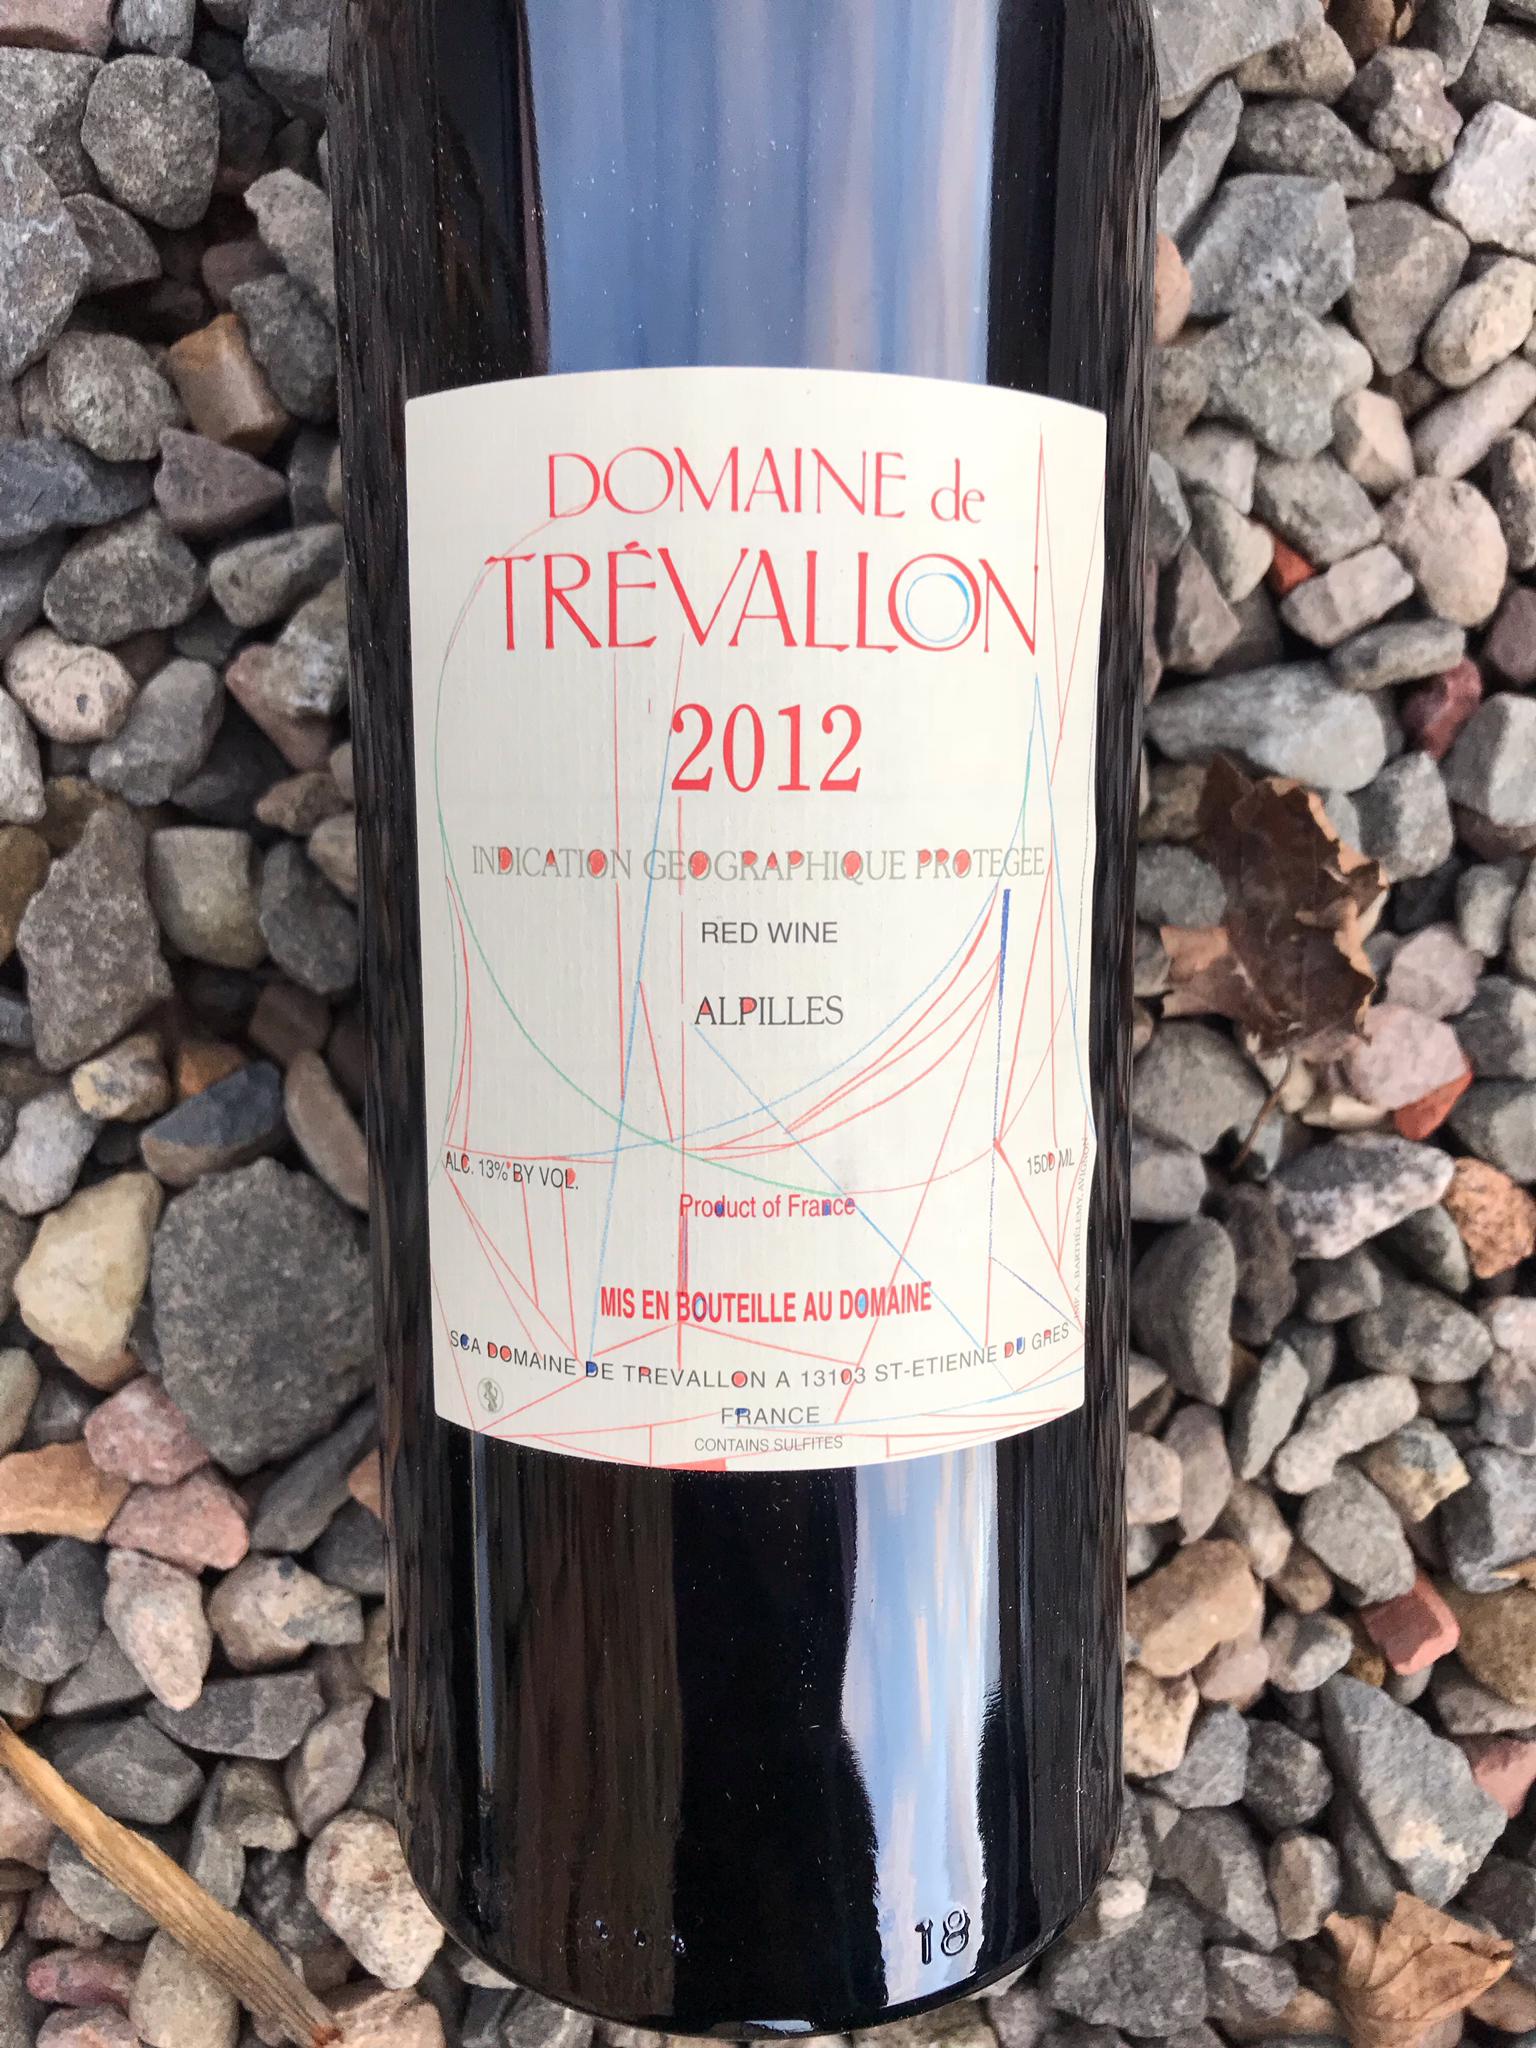 Domaine de Trevallon 2012 (Syrah/Cabernet Sauvignon) Magnum 00207